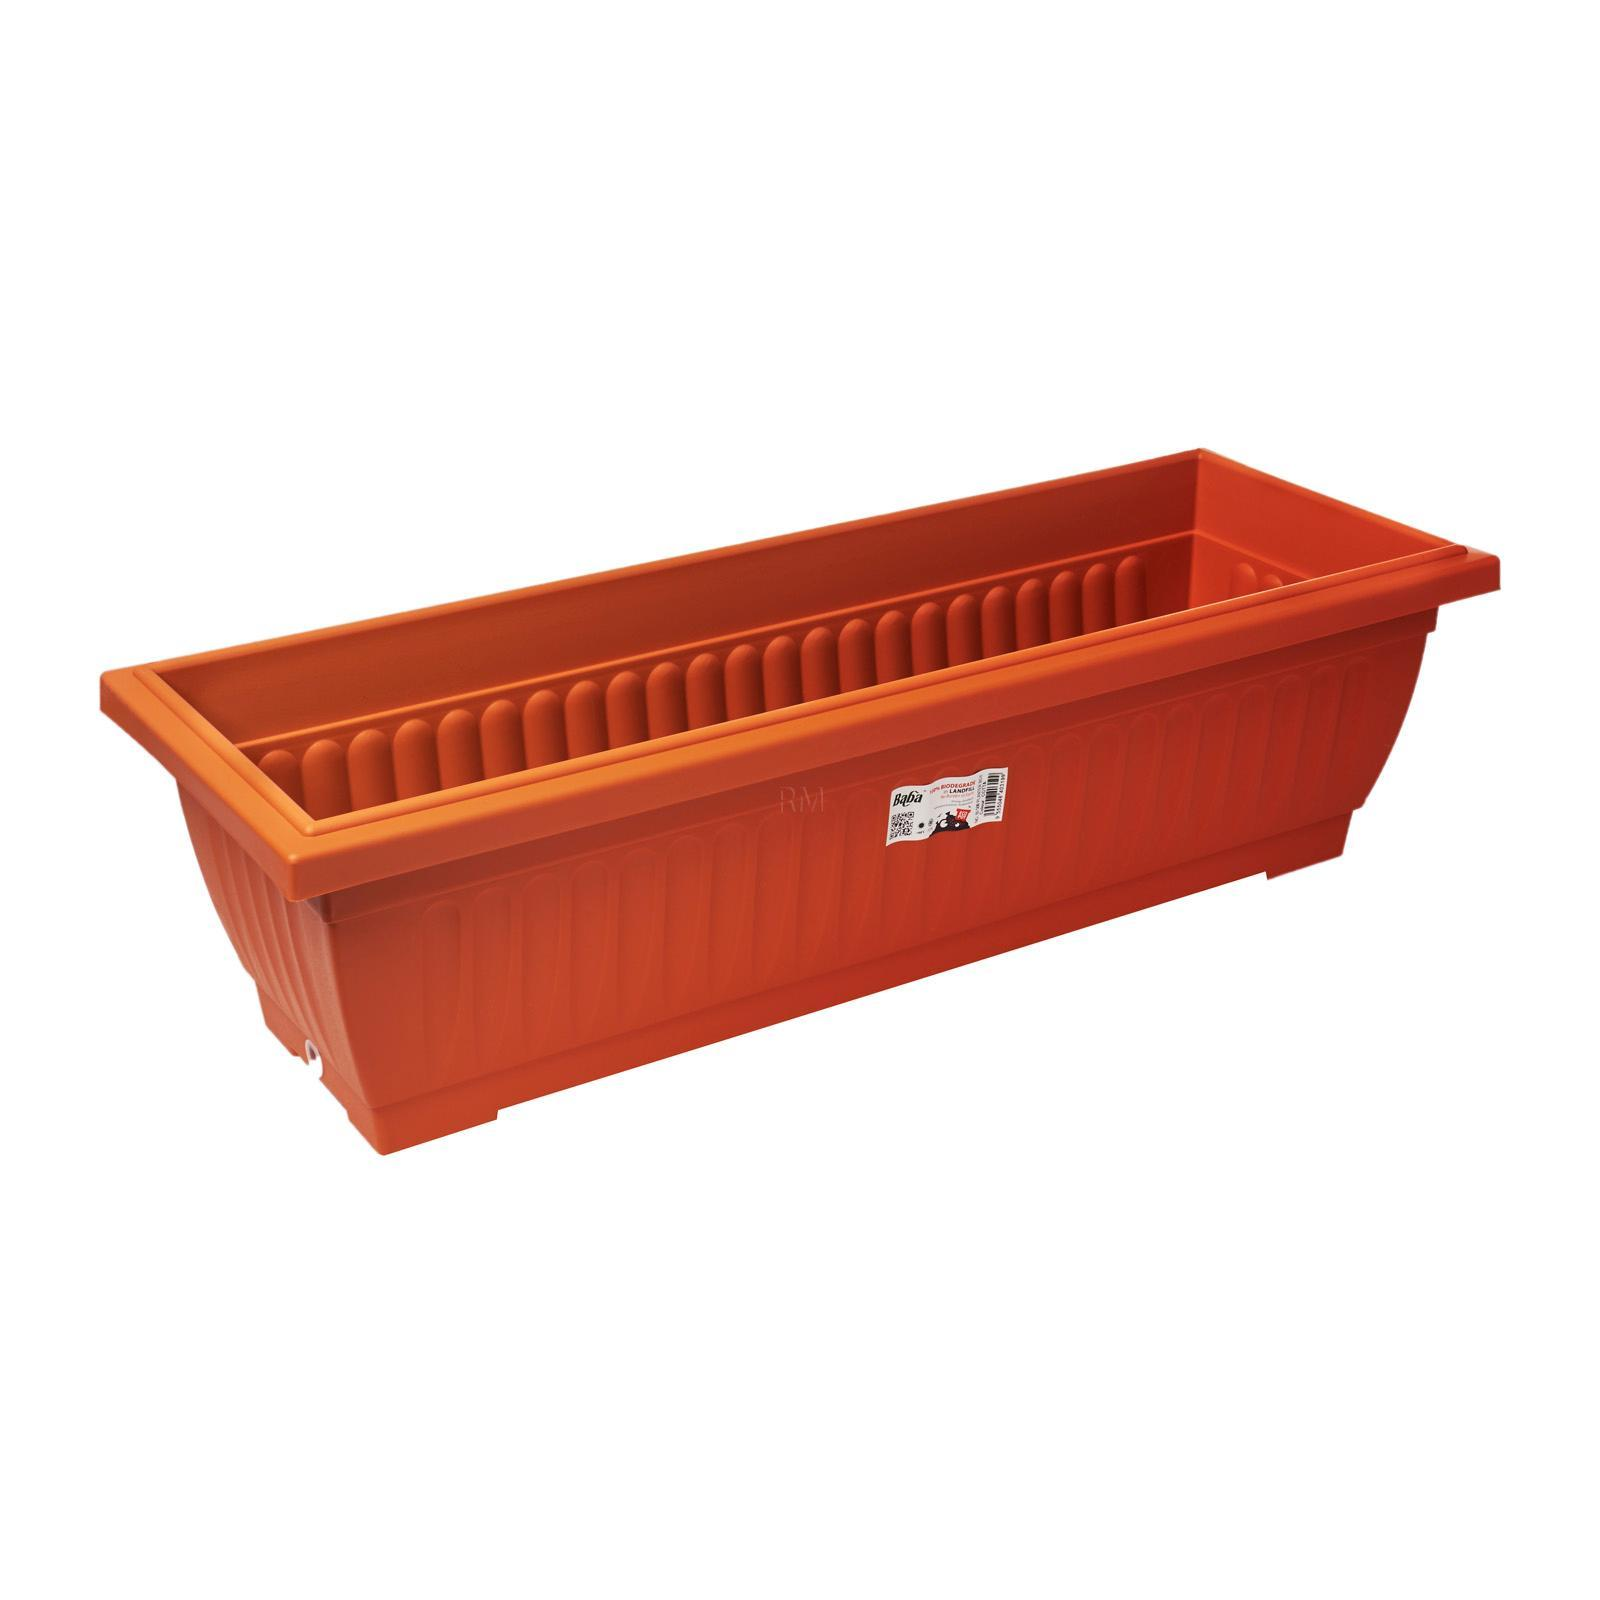 Price Baba Planter Box 685Mm X 245Mm Steve Leif Online